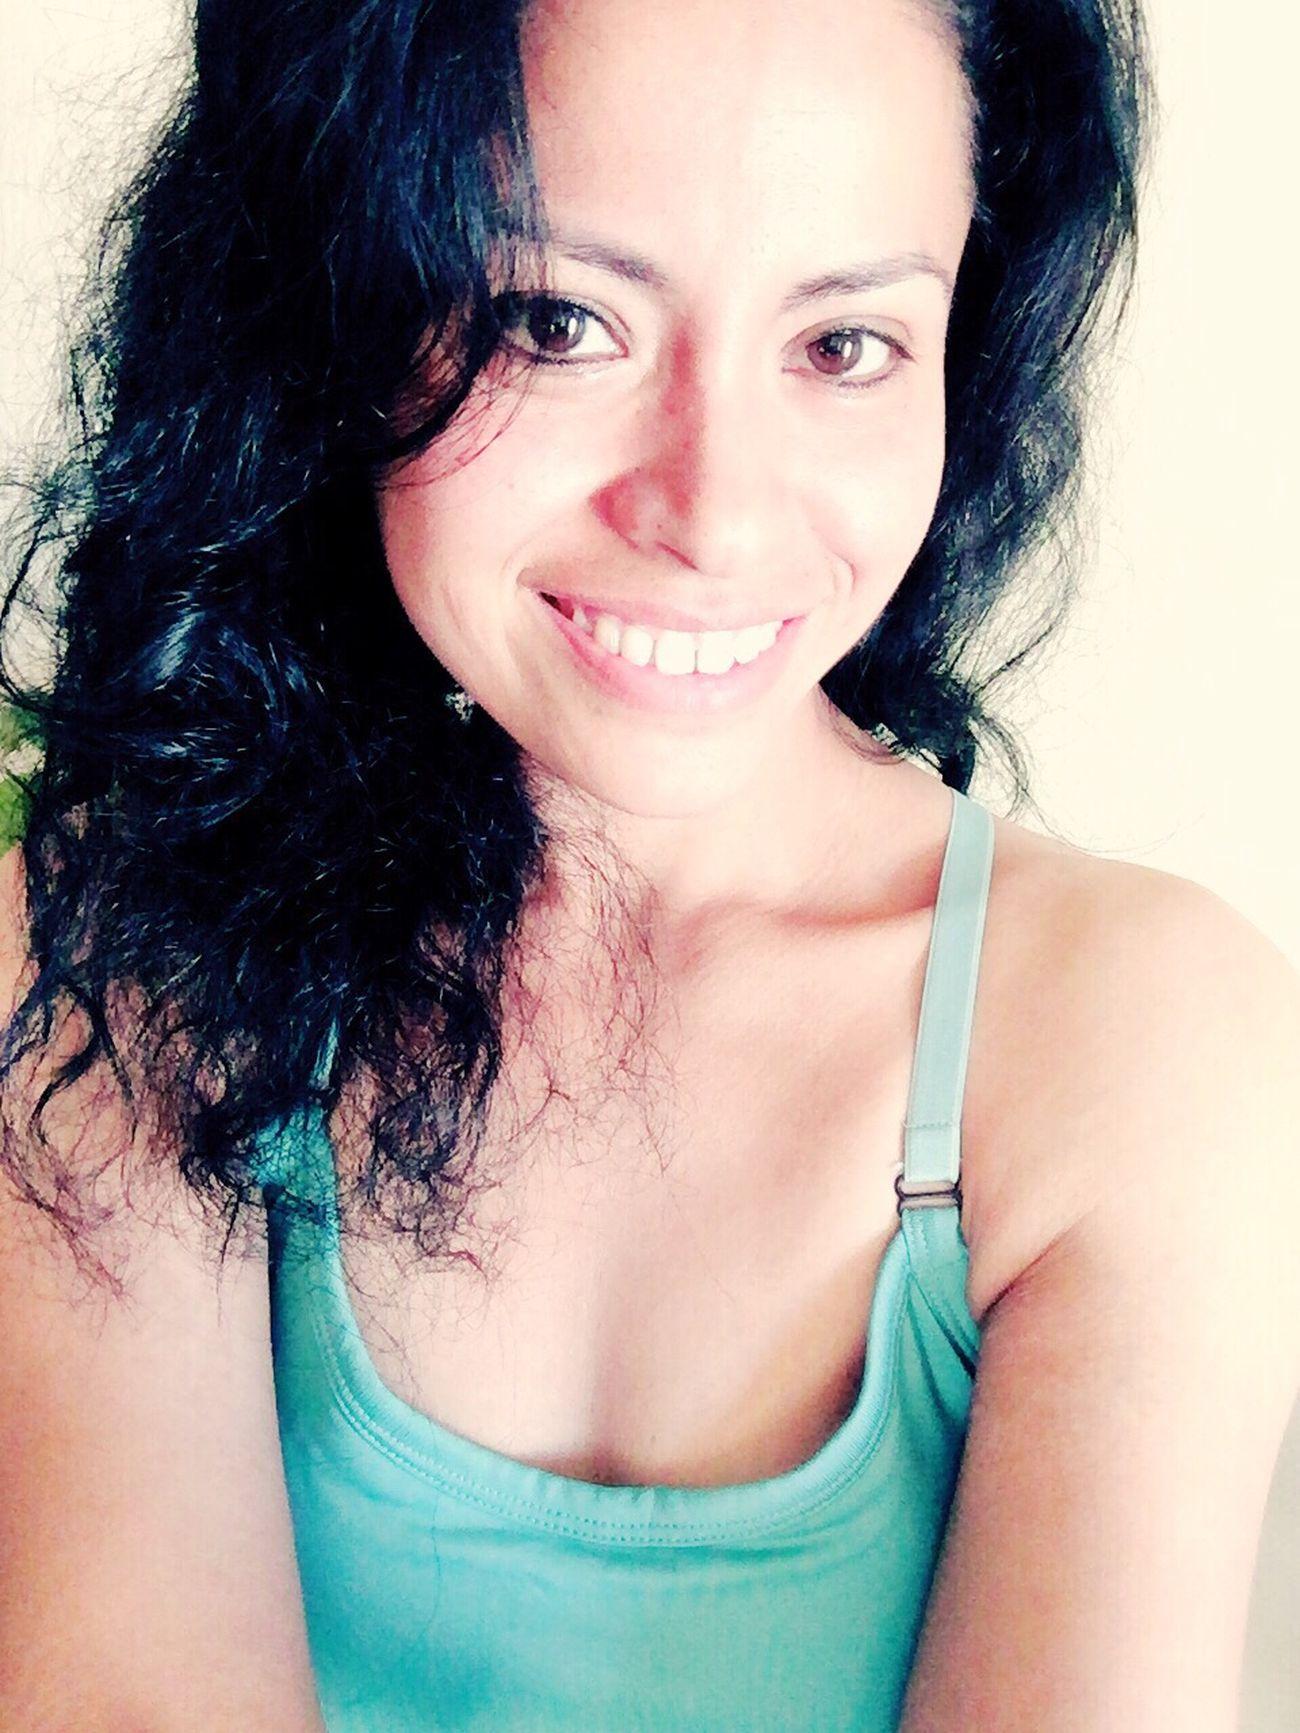 Sábado de flojera en casa... Sinmaquillaje #al Natural LoveMe Selfie Enpijama